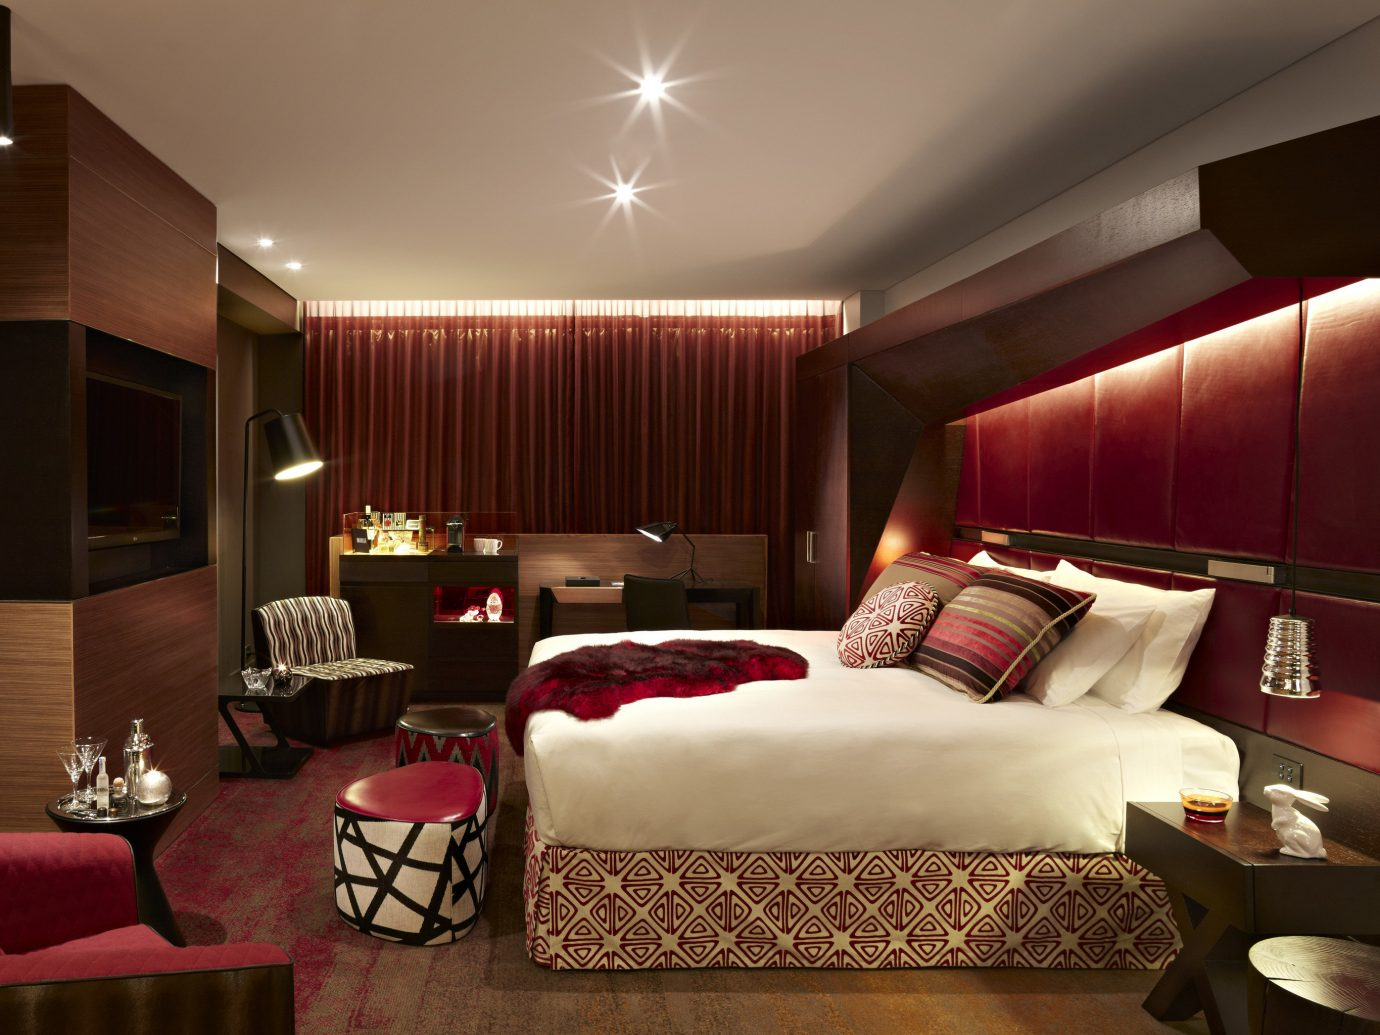 Hotels Romance wall indoor ceiling bed room red floor hotel Suite living room Bedroom interior design estate decorated furniture